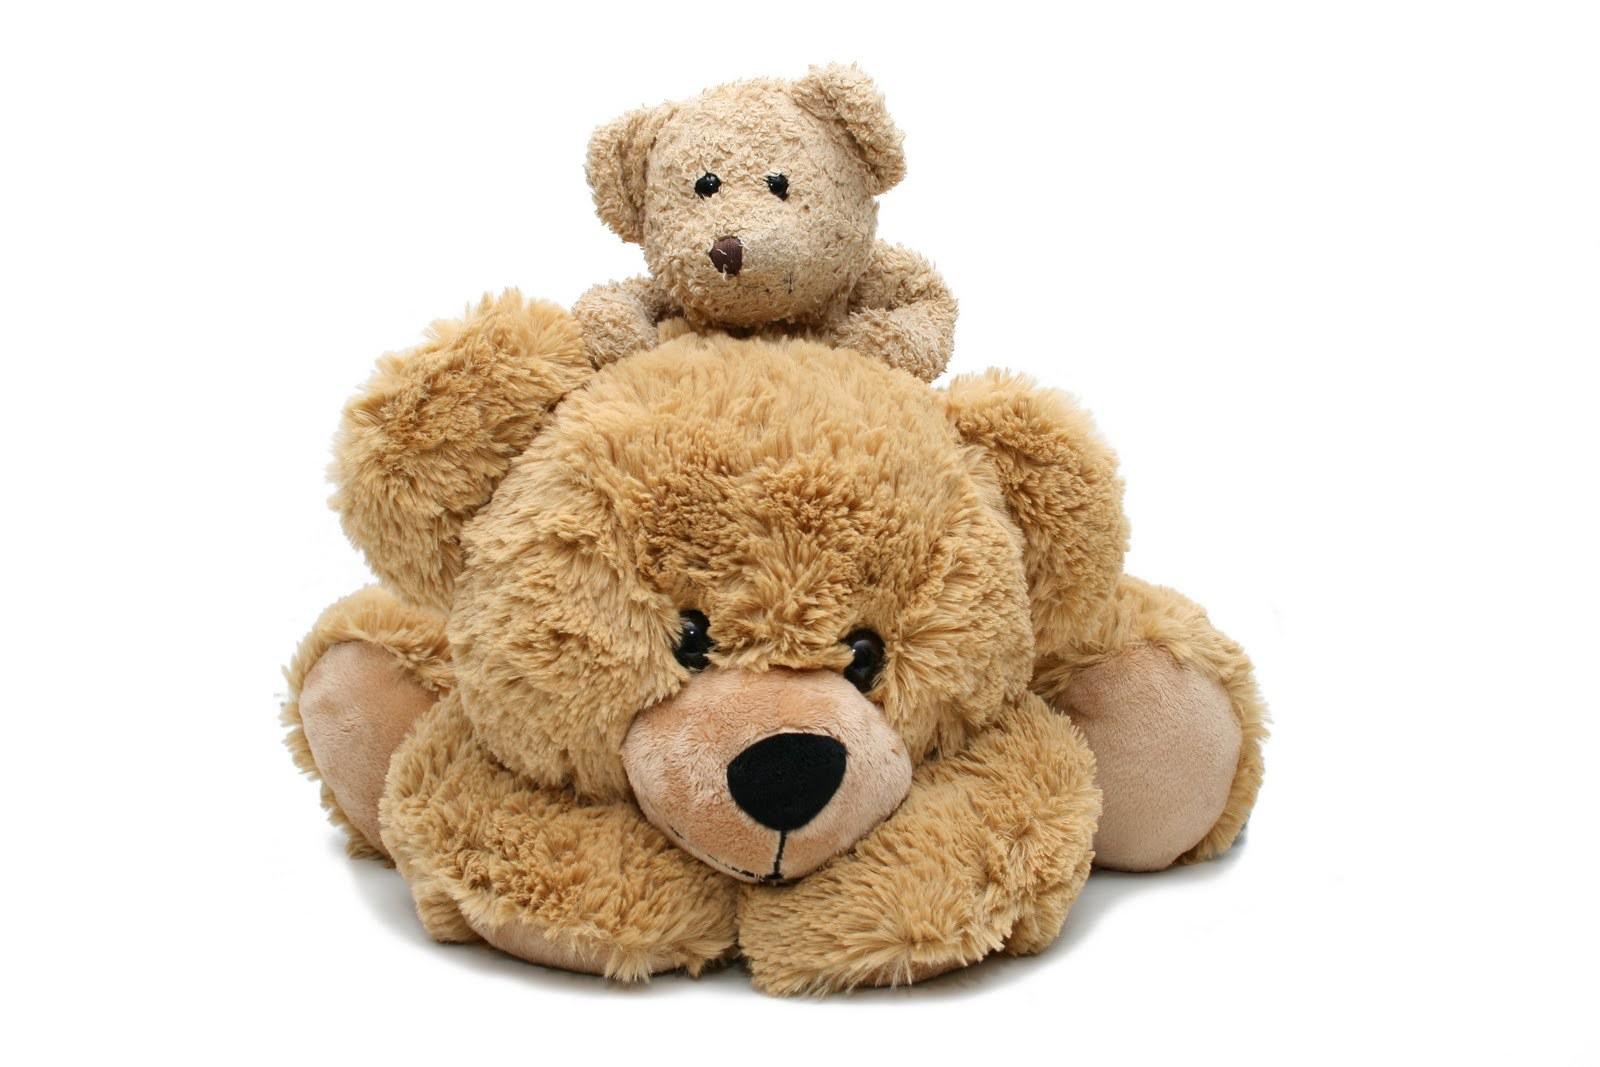 Teddy Bear Widescreen